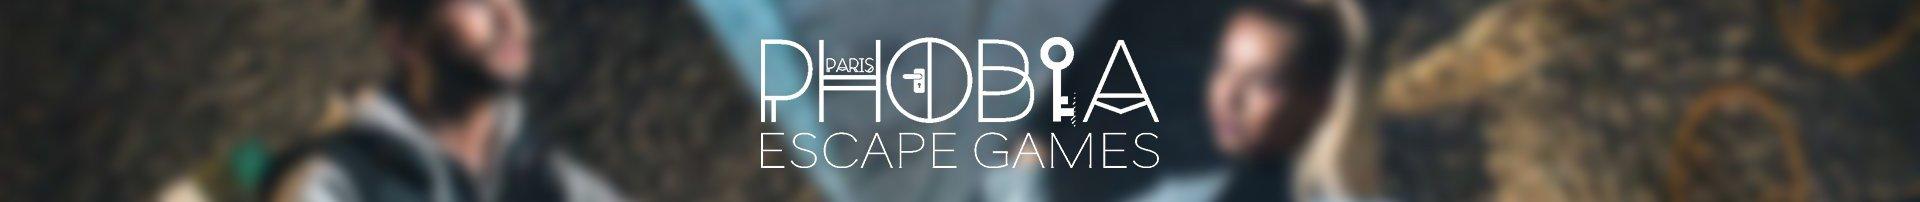 Phobia escape game Da Vinci.jpg